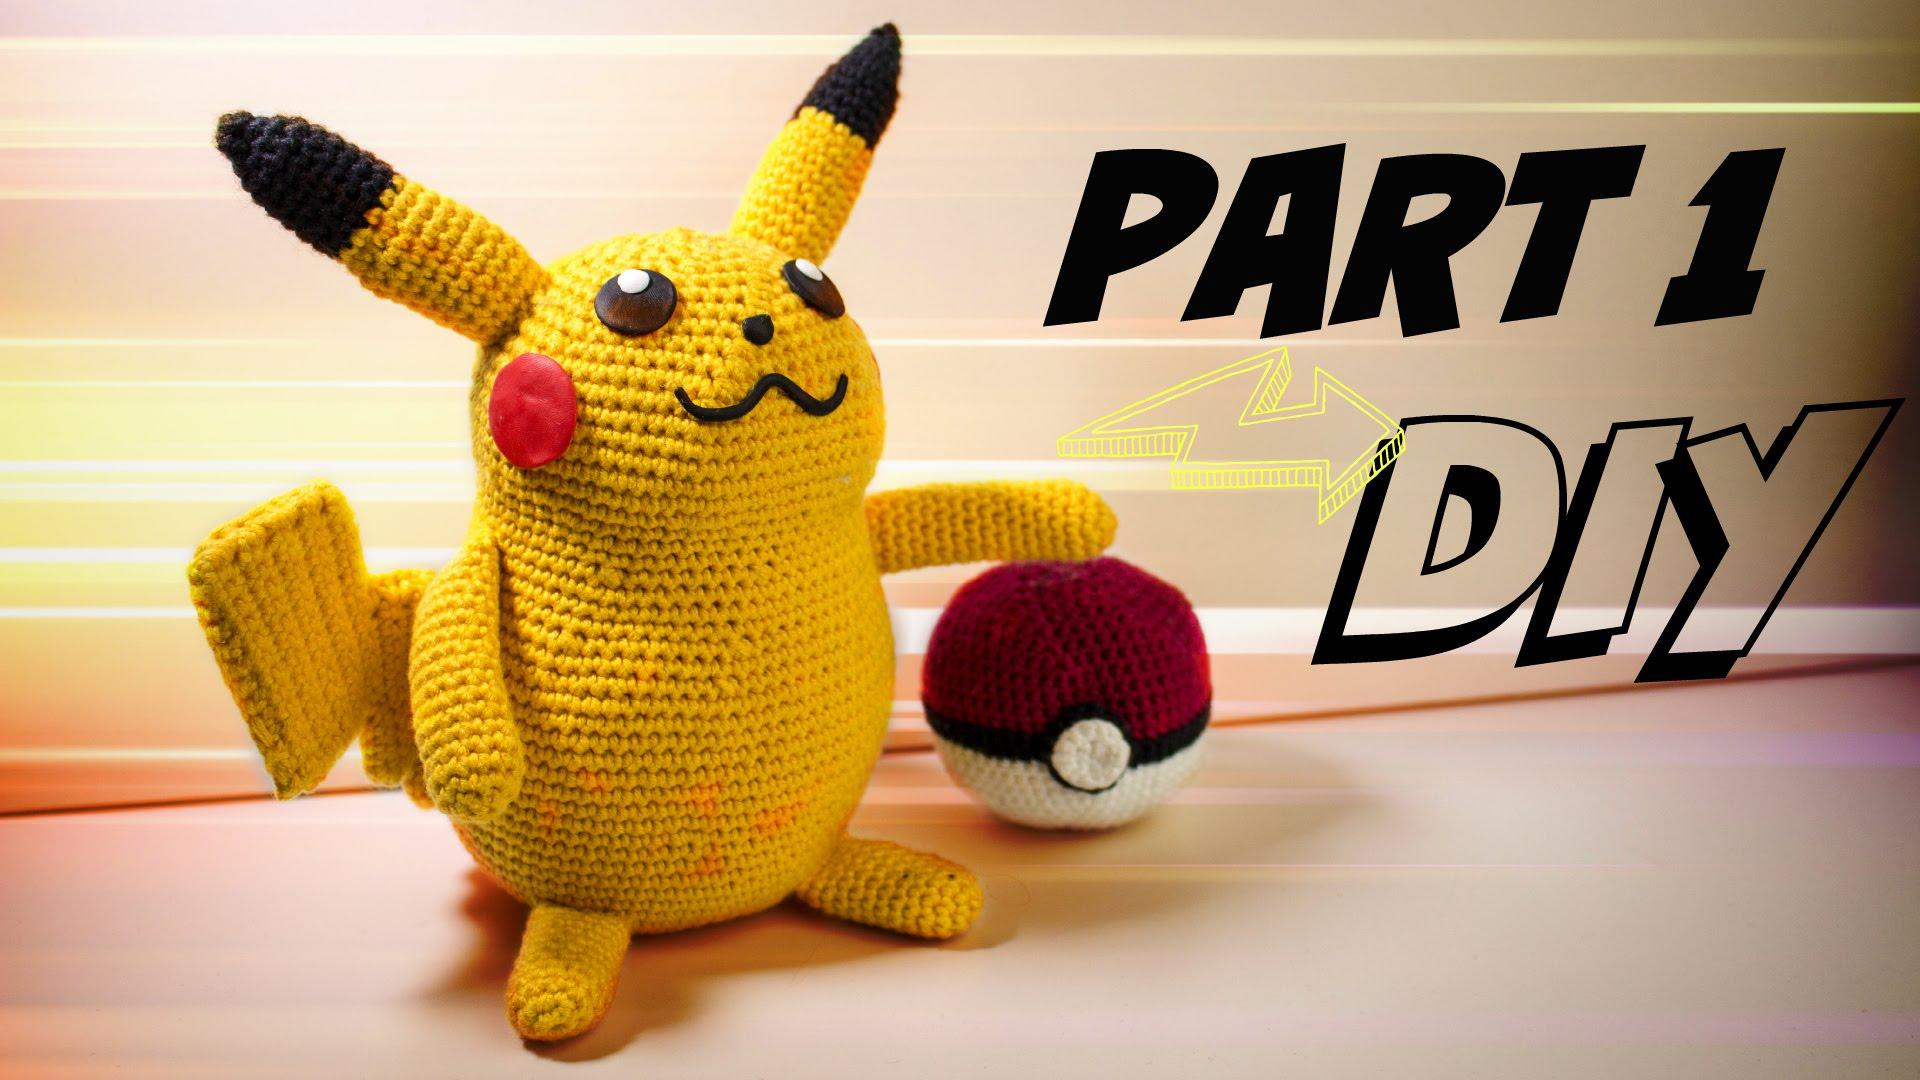 Pikachu Pokémon Justmikode Gratis Anleitungen Zum Häkeln